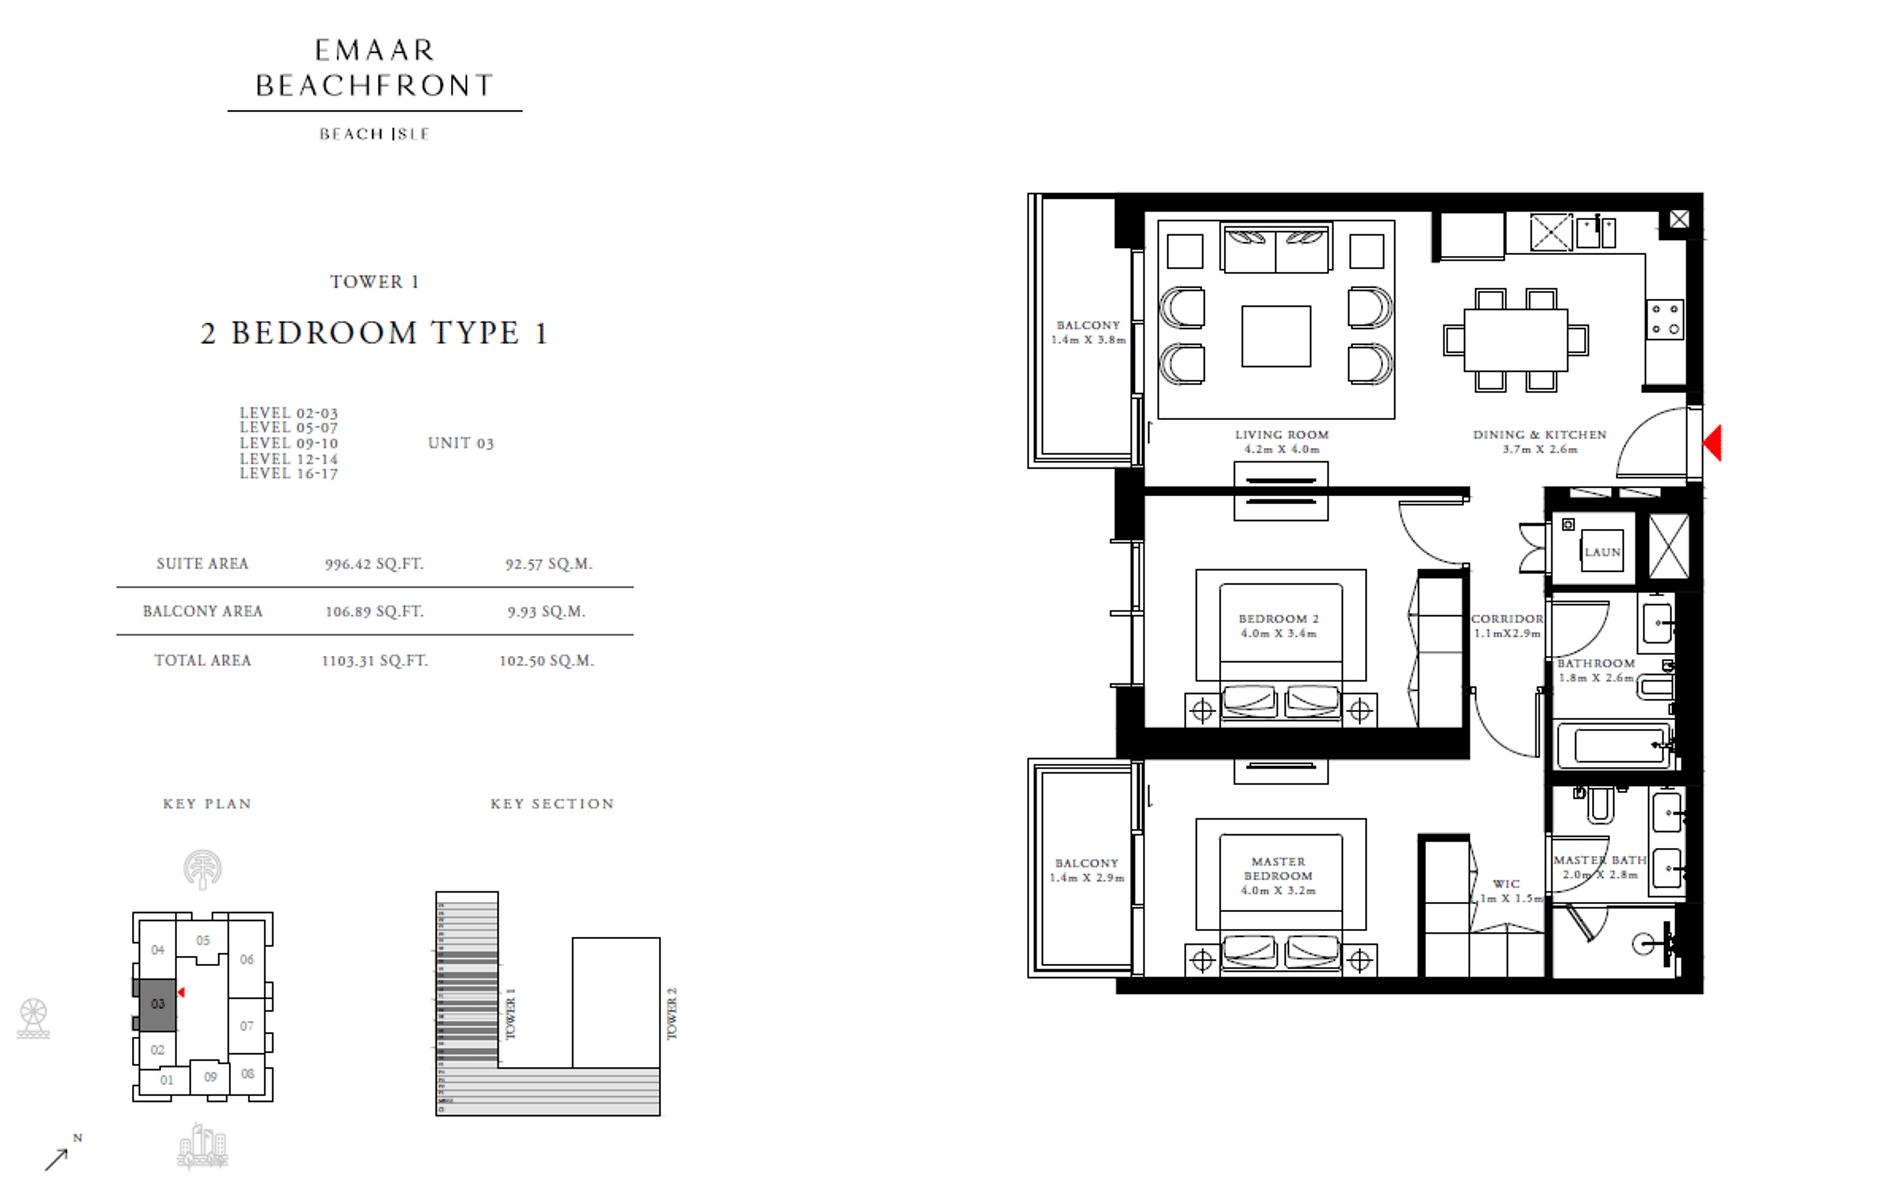 2-Bedroom Apartment Typ 1 03